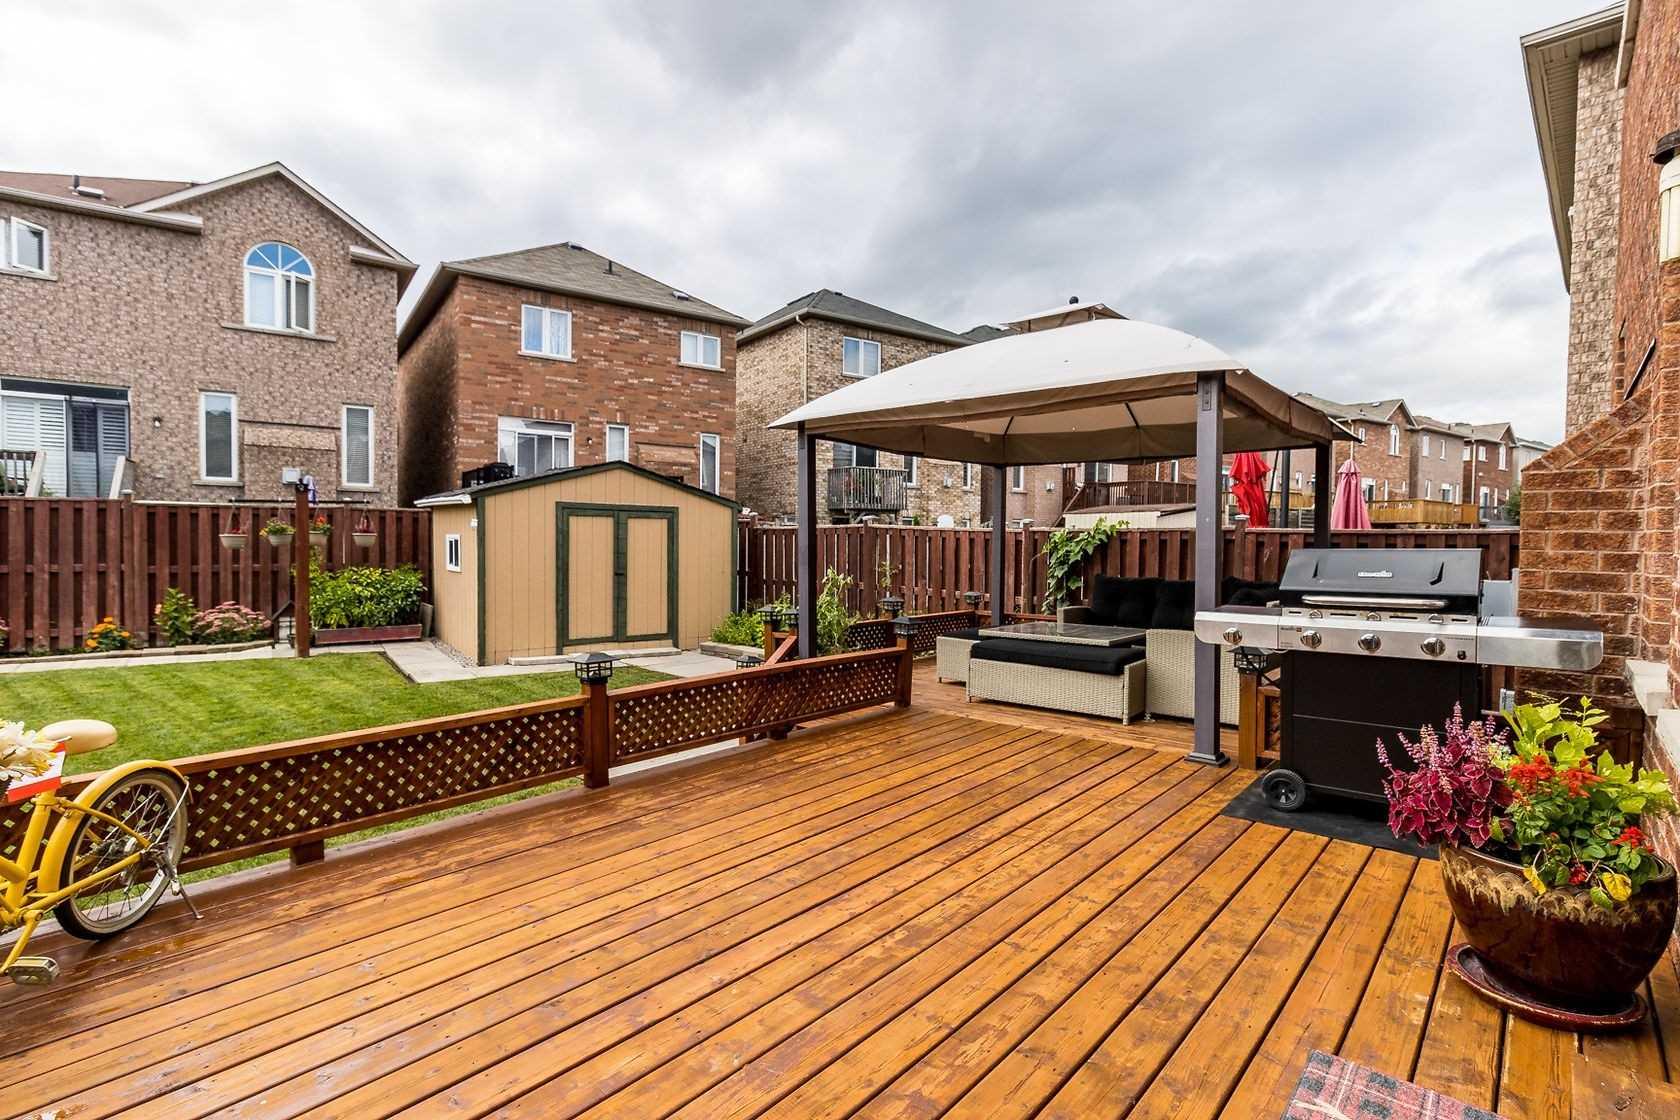 Detached house For Sale In Brampton - 66 Stoneylake Ave, Brampton, Ontario, Canada L6V 4T3 , 4 Bedrooms Bedrooms, ,4 BathroomsBathrooms,Detached,For Sale,Stoneylake